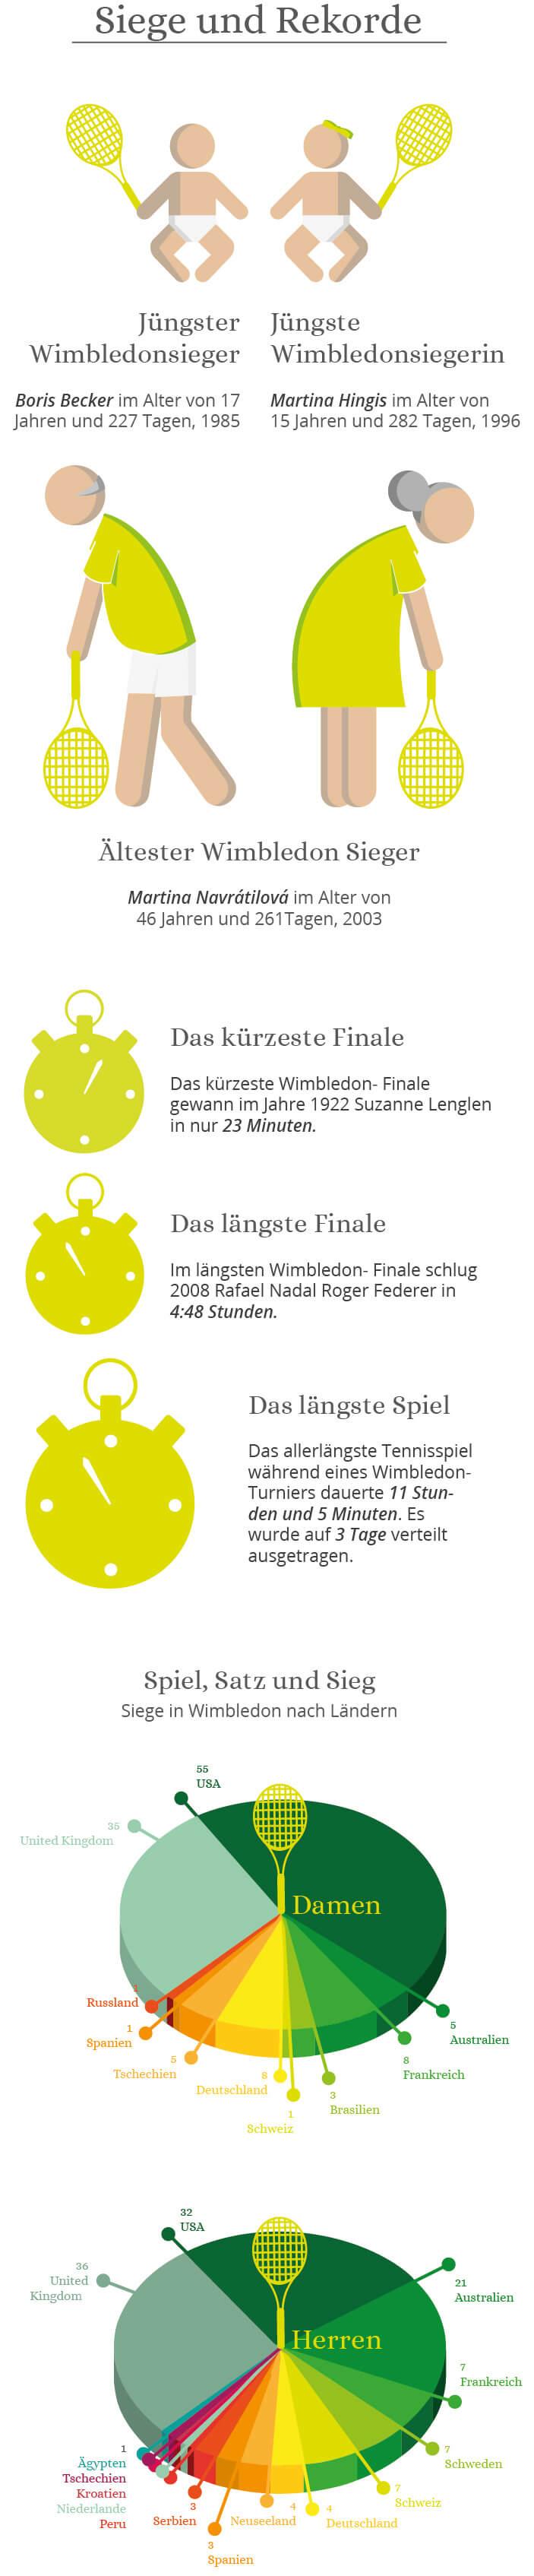 Wimbledon-Siege-Rekorde-infografik